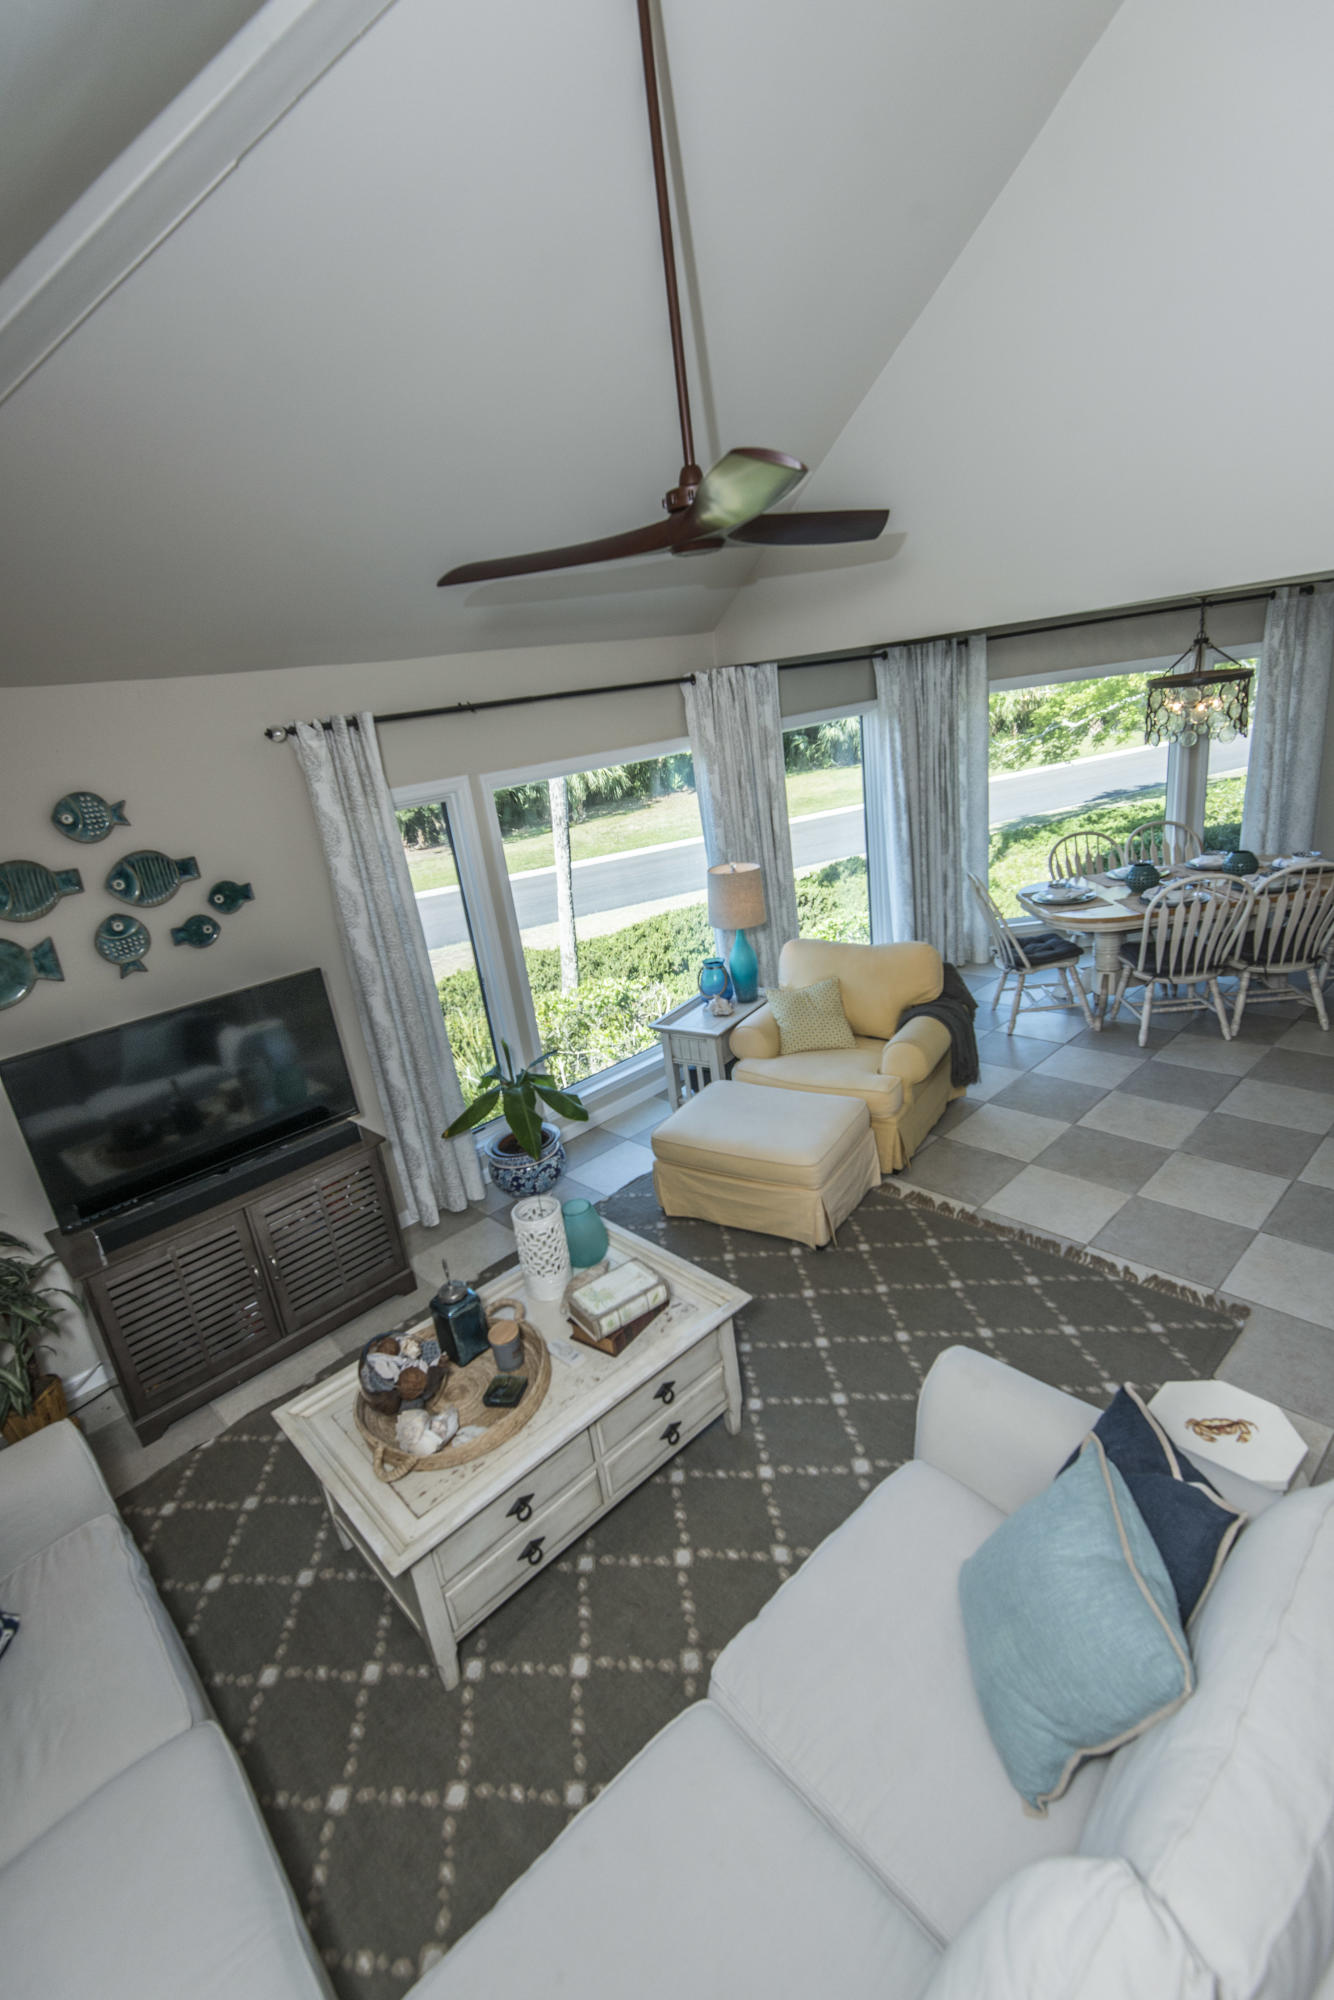 Spinnaker Beachouse Homes For Sale - 723 Spinnaker Beachhouse, Johns Island, SC - 16